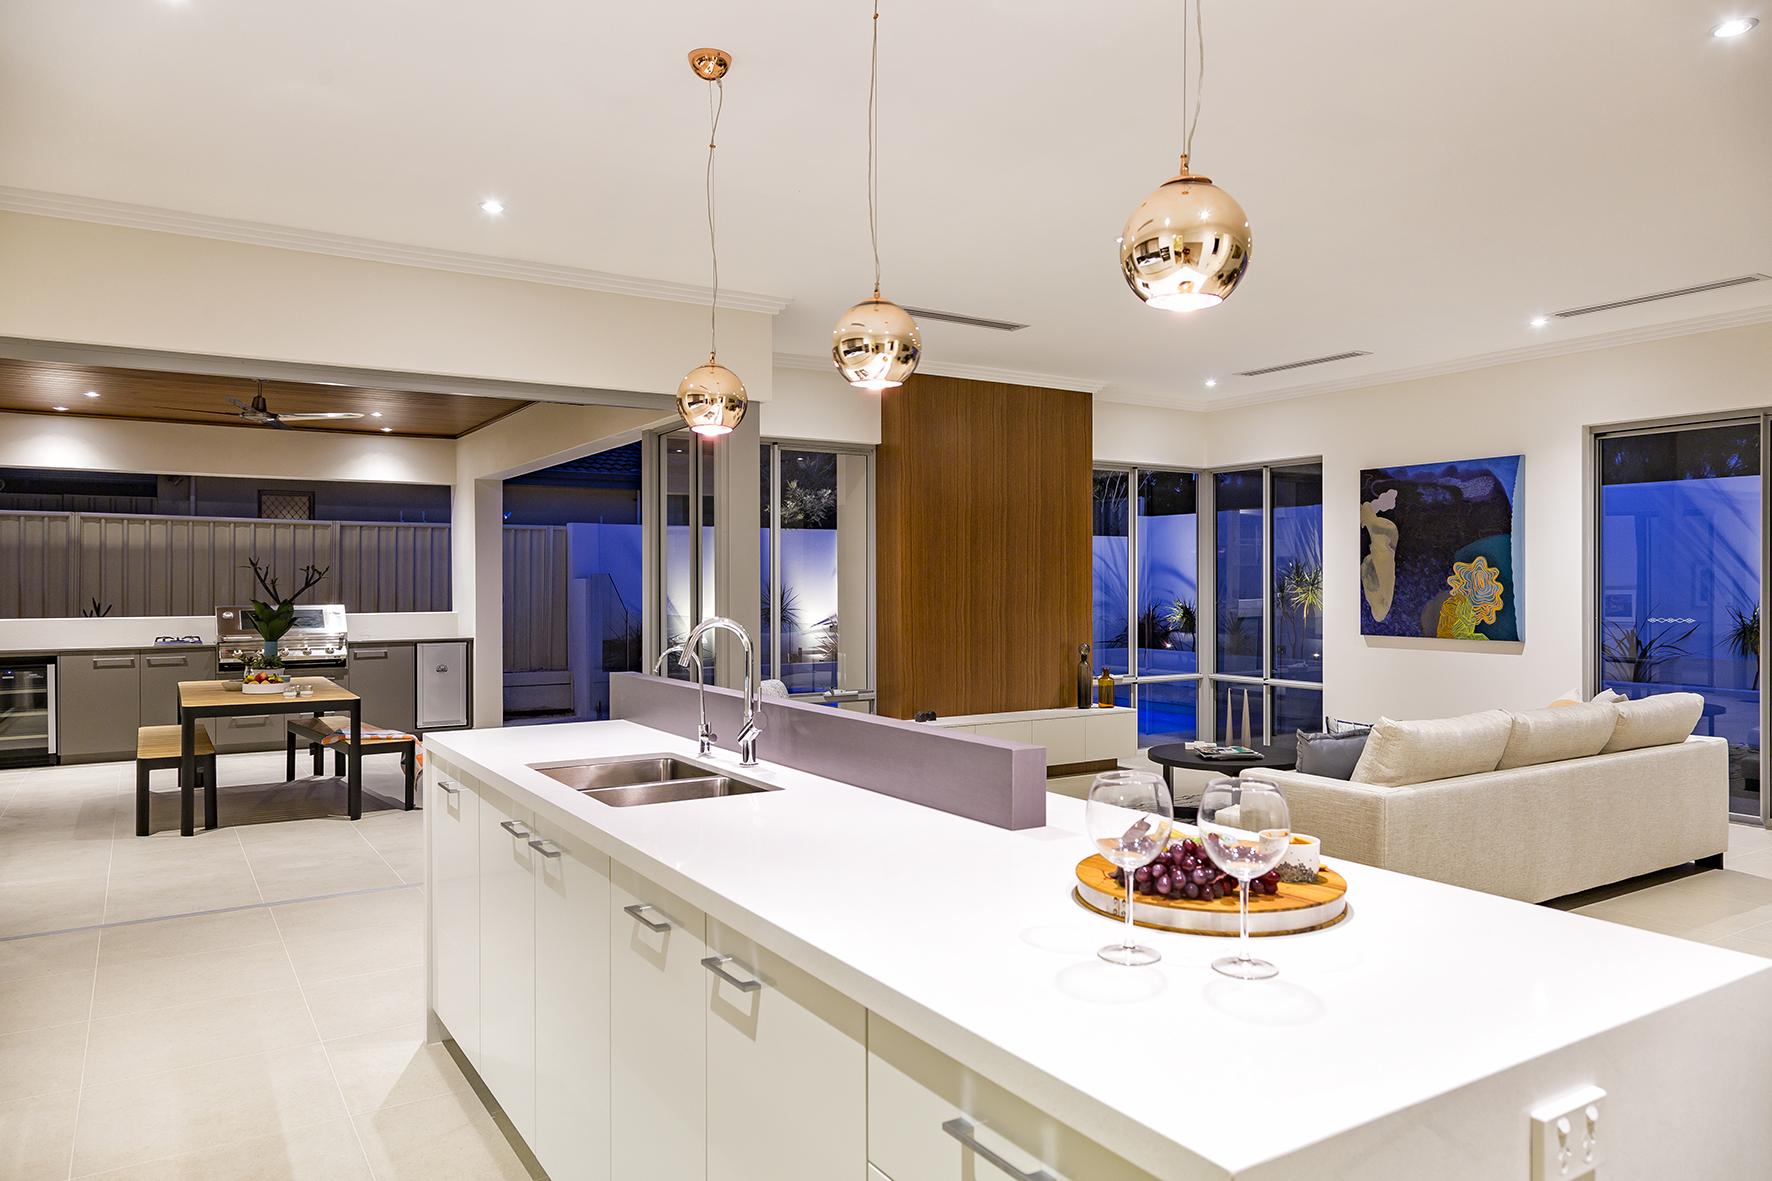 Brisbane Cupboard Door Handles - Enhance your kitchen affordably.